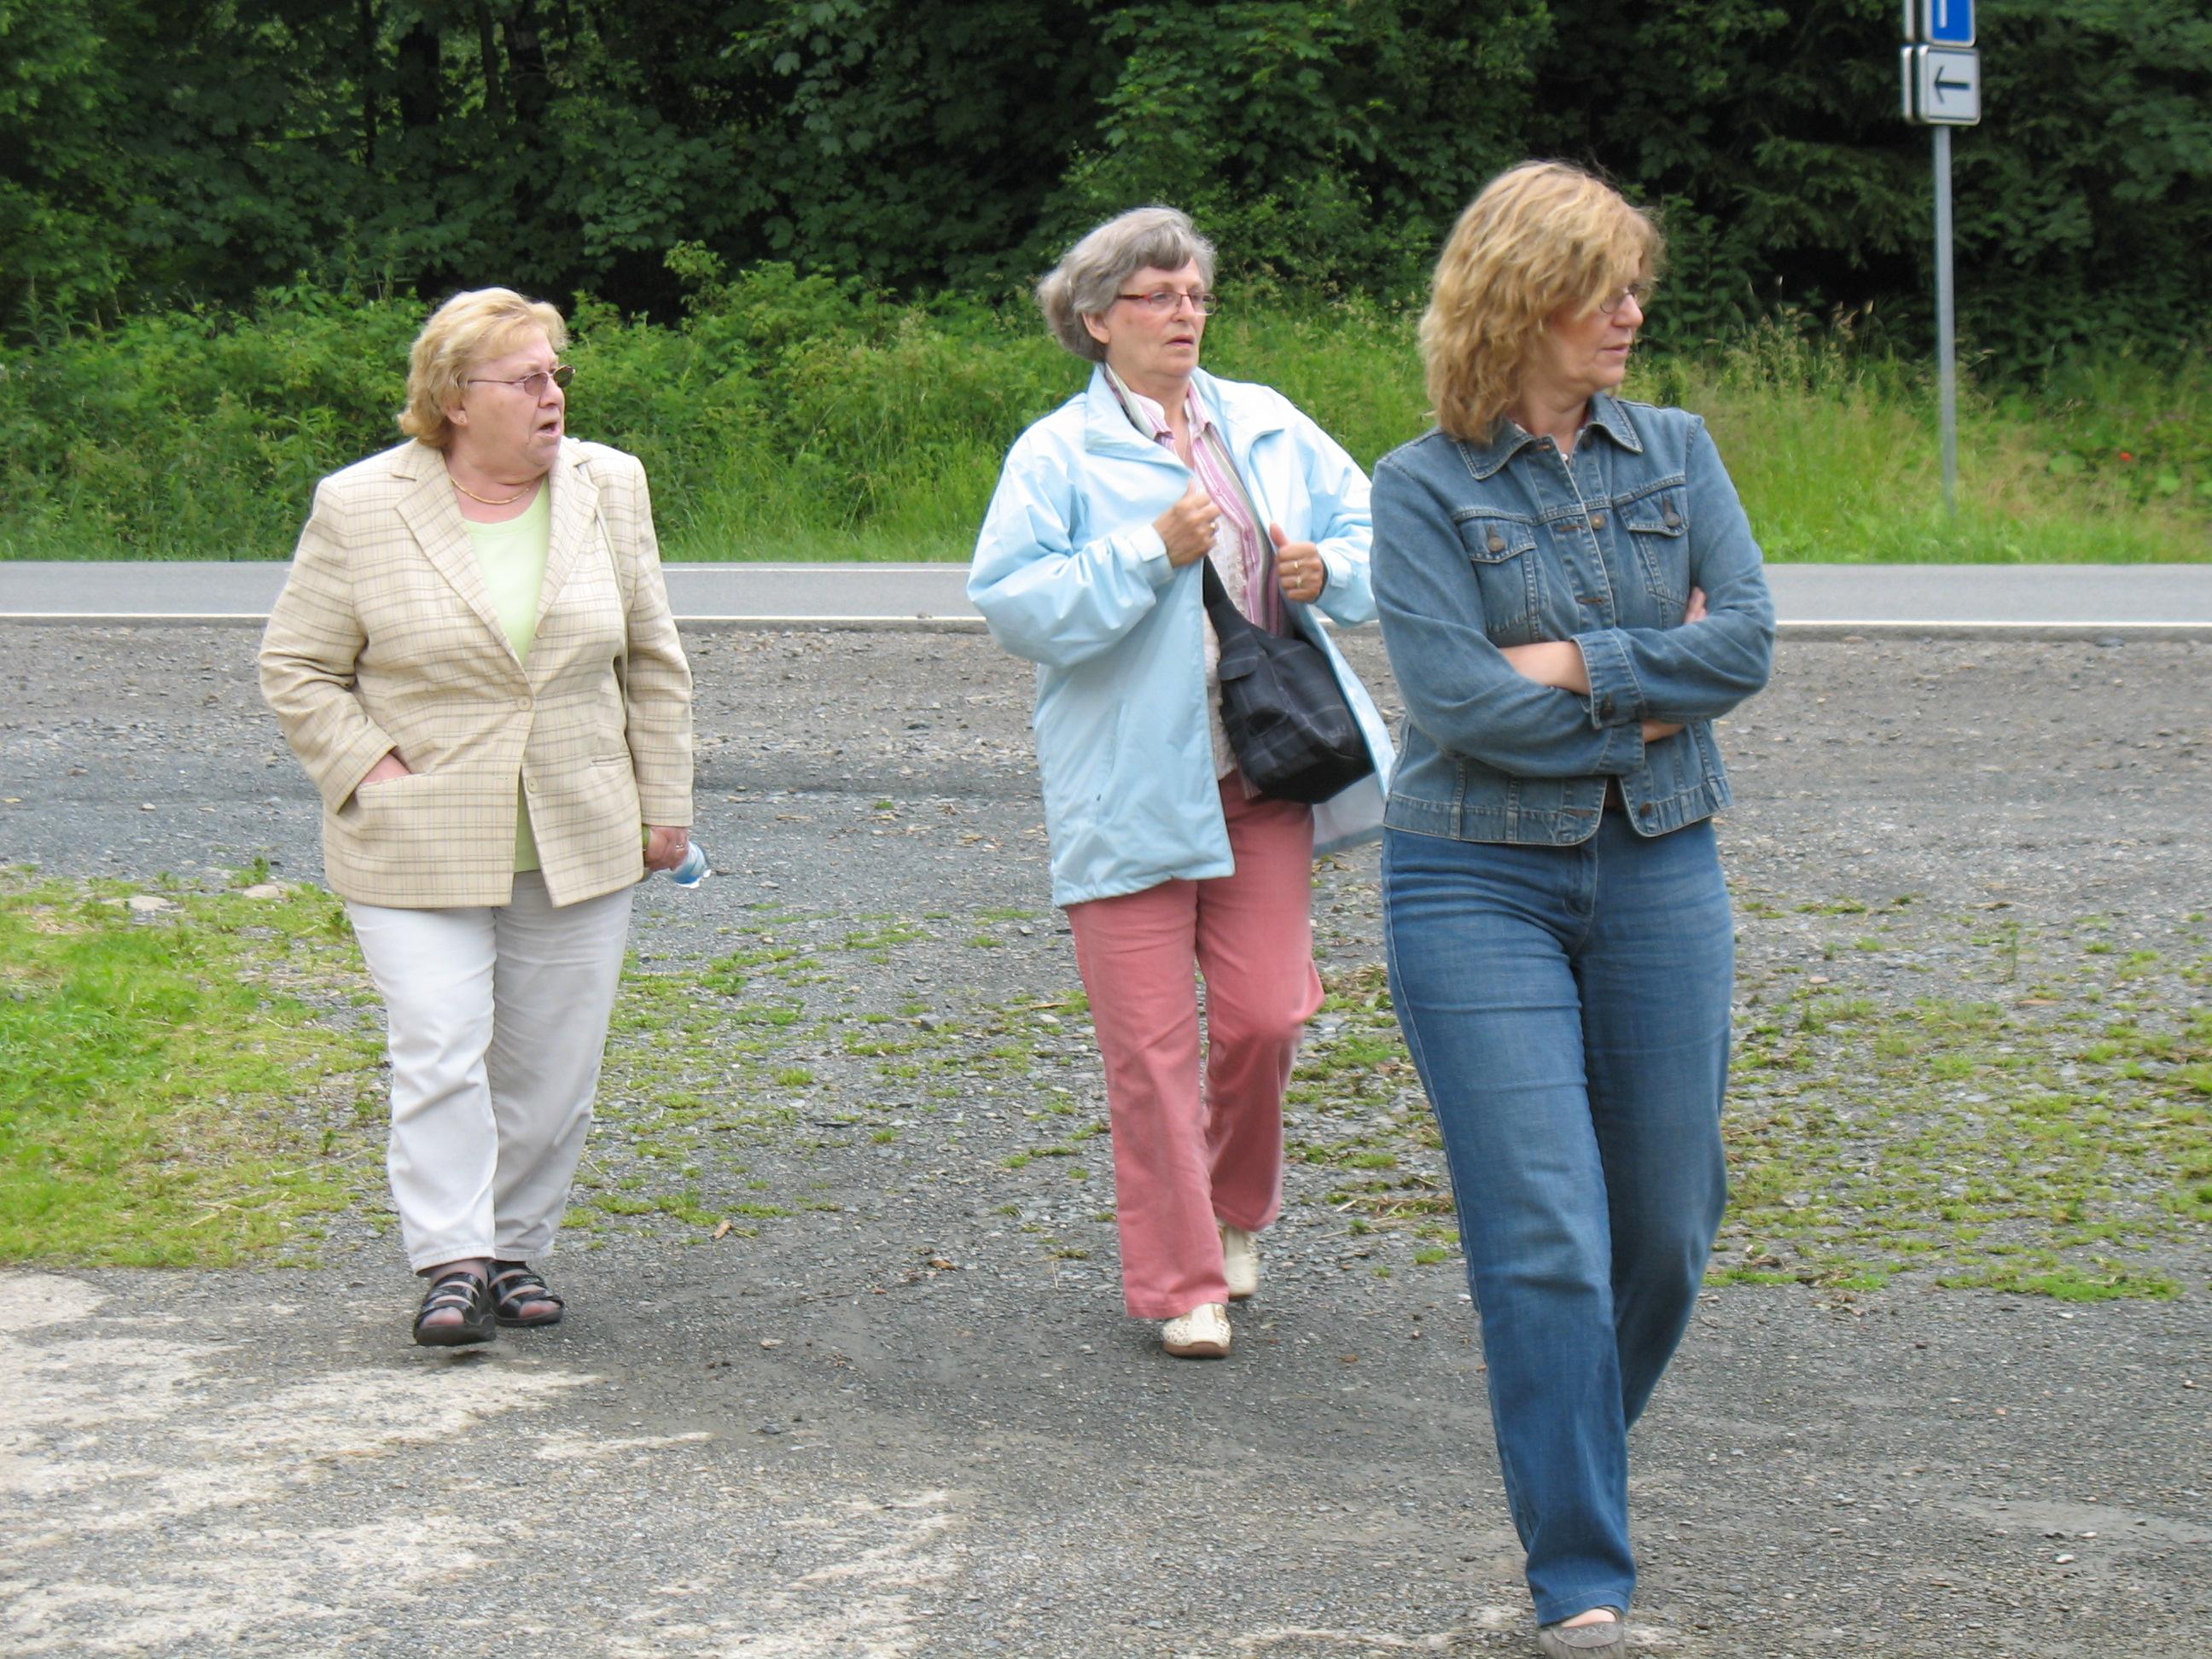 http://www.tsc-blausilber.de/media/bilder_intern/2012_Kraeuterwanderung_Blau-Silber/IMG_0040.JPG